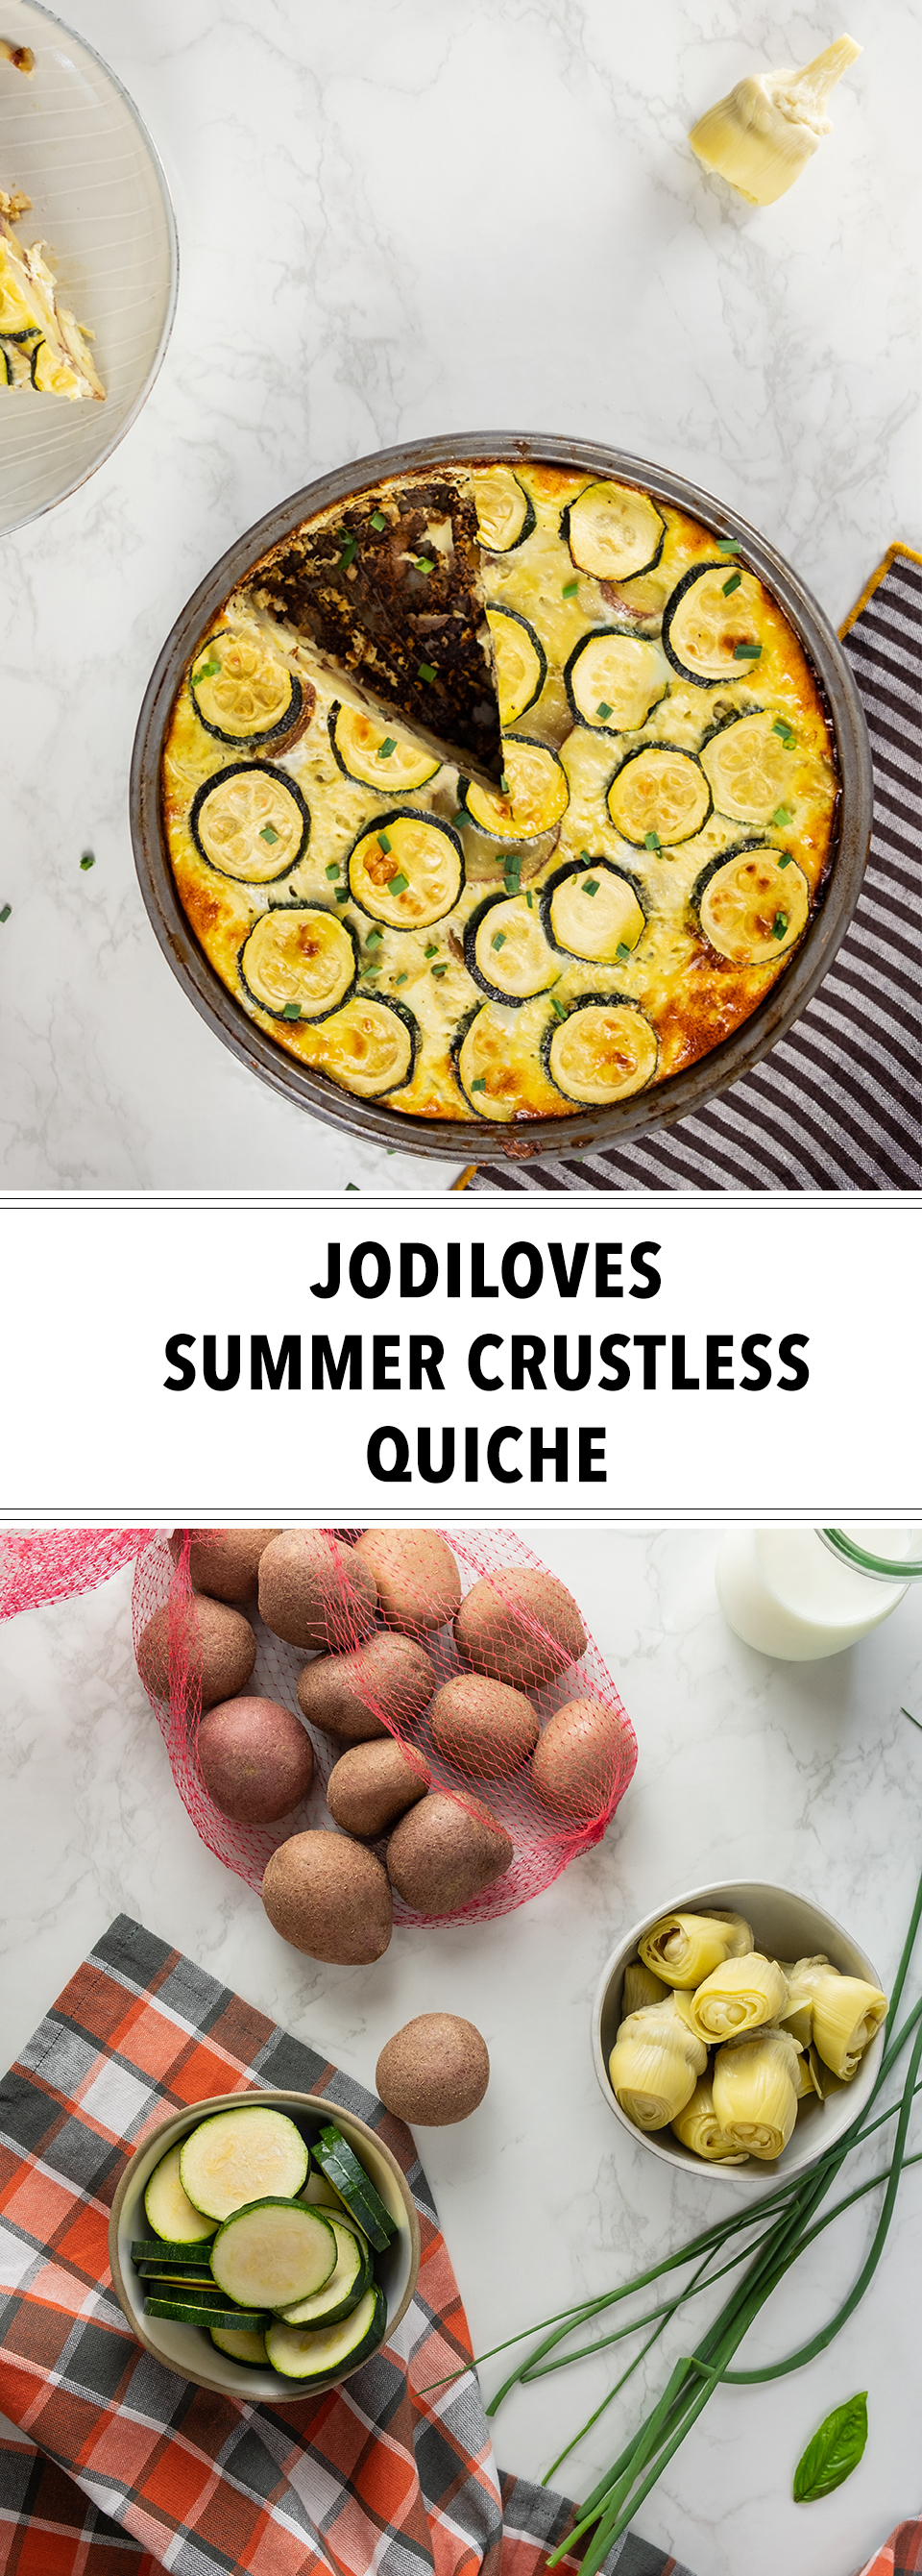 JodiLoves_Retouching_Brilliant_Pixel_Imaging-Summer-Crustless-Quiche.jpg